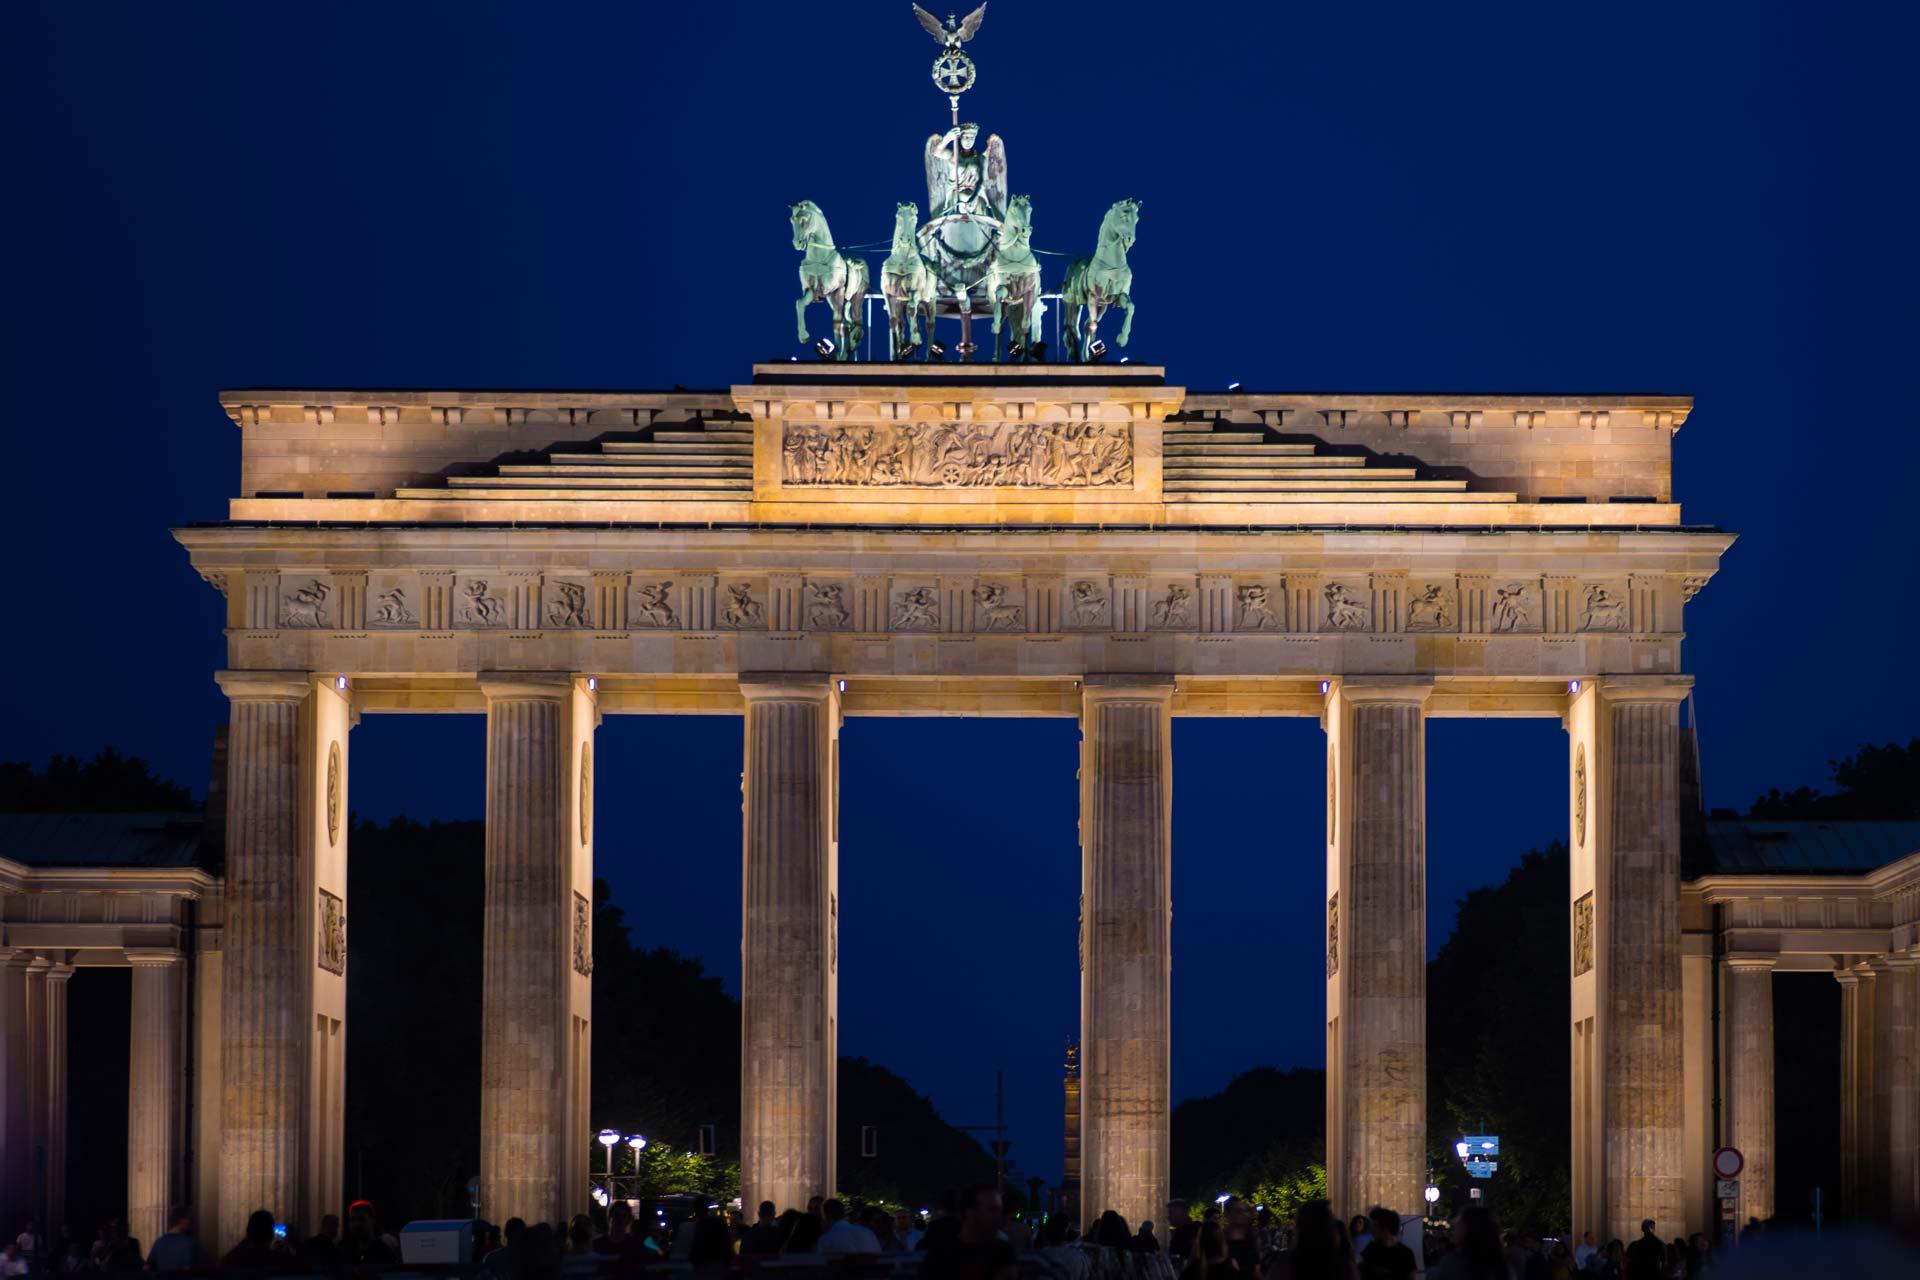 Nachtfotografie - Brandenburger Tor